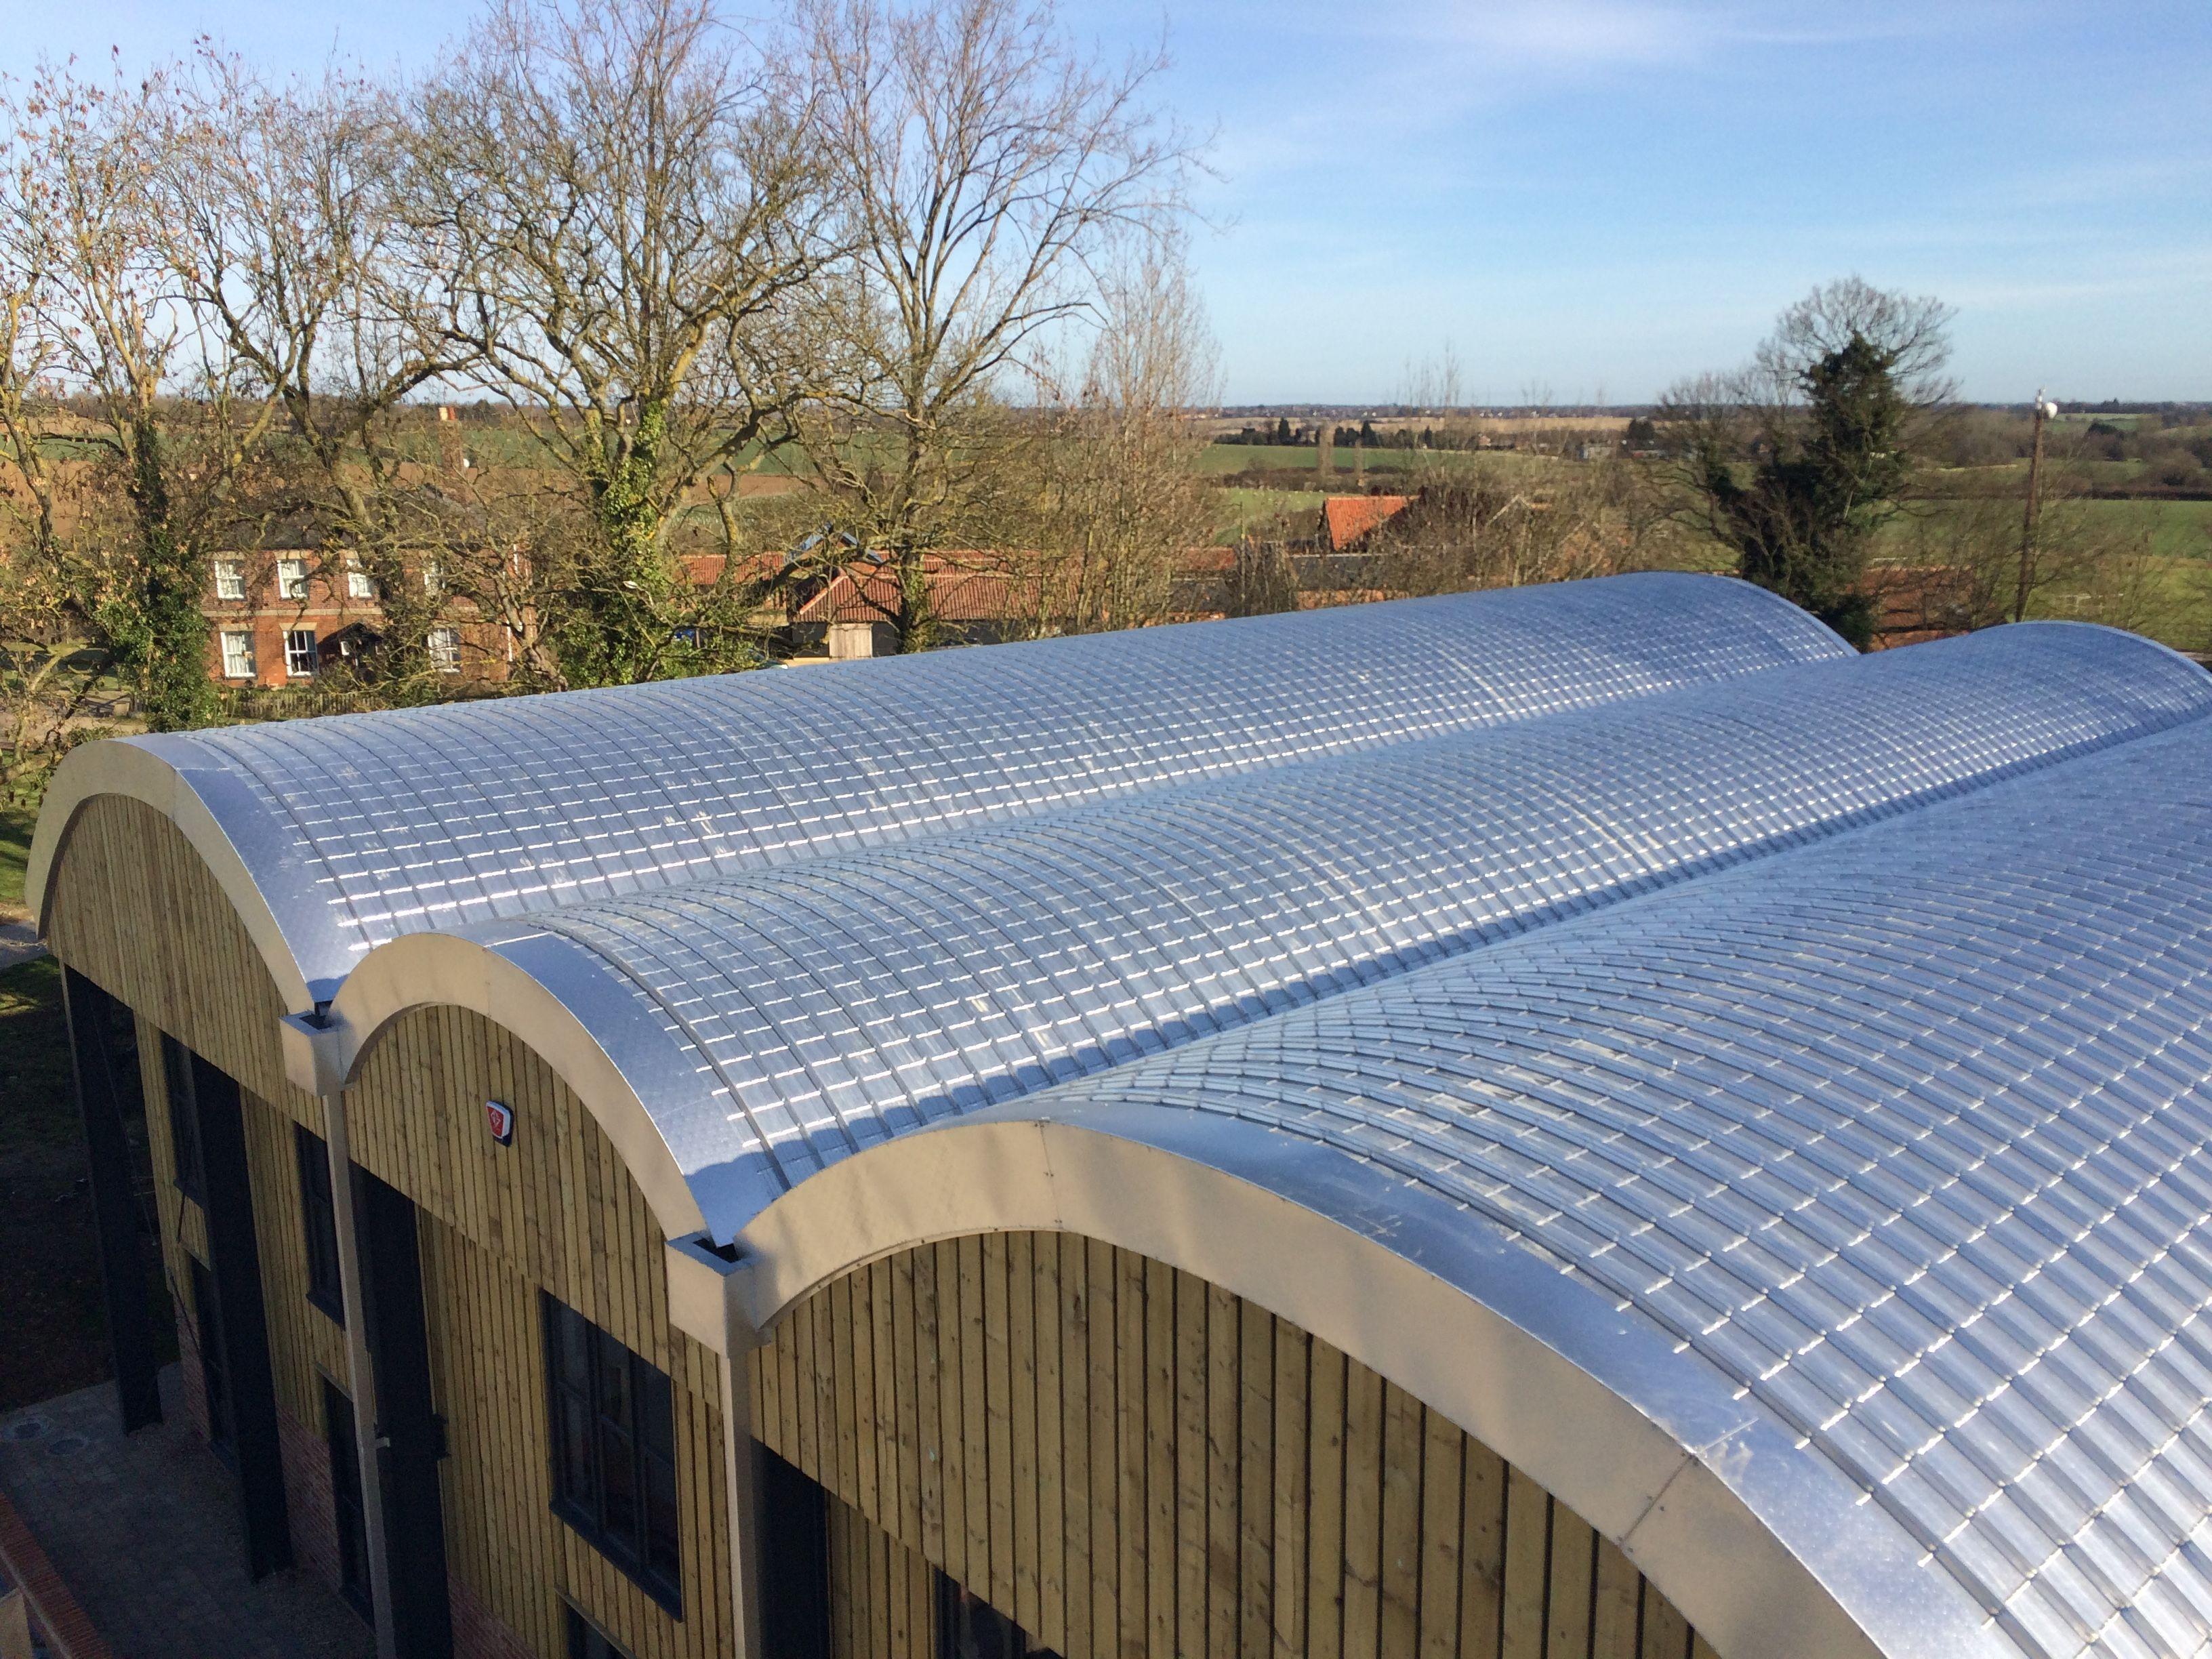 Top 10 Reasons To Choose Standing Seam Metal Roofing Metal Roofing Prices Metal Roofing Systems Standing Seam